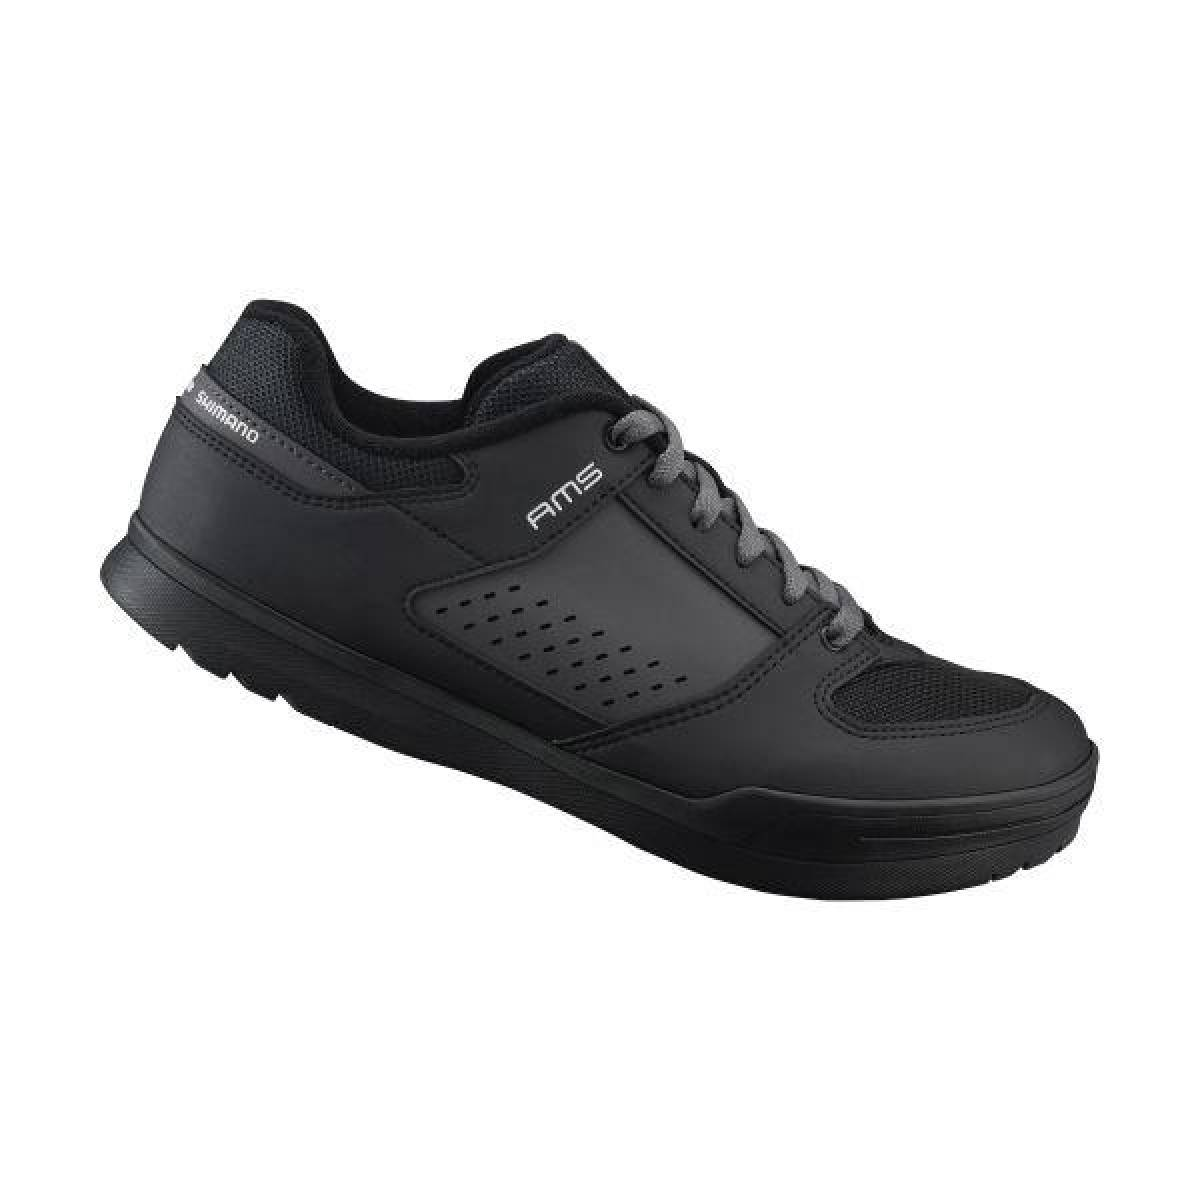 SHIMANO gravity obuv SH-AM501ML, černá, 37